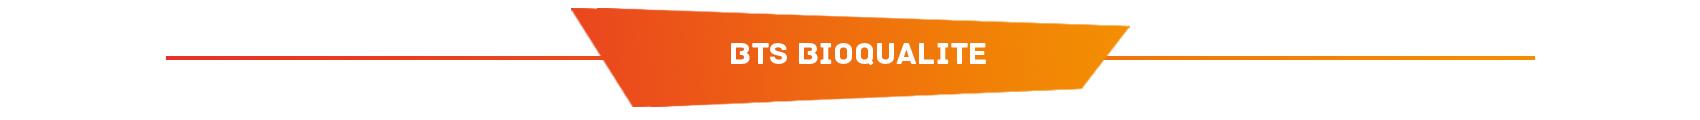 BTS Bioqualité (ex QIABI)